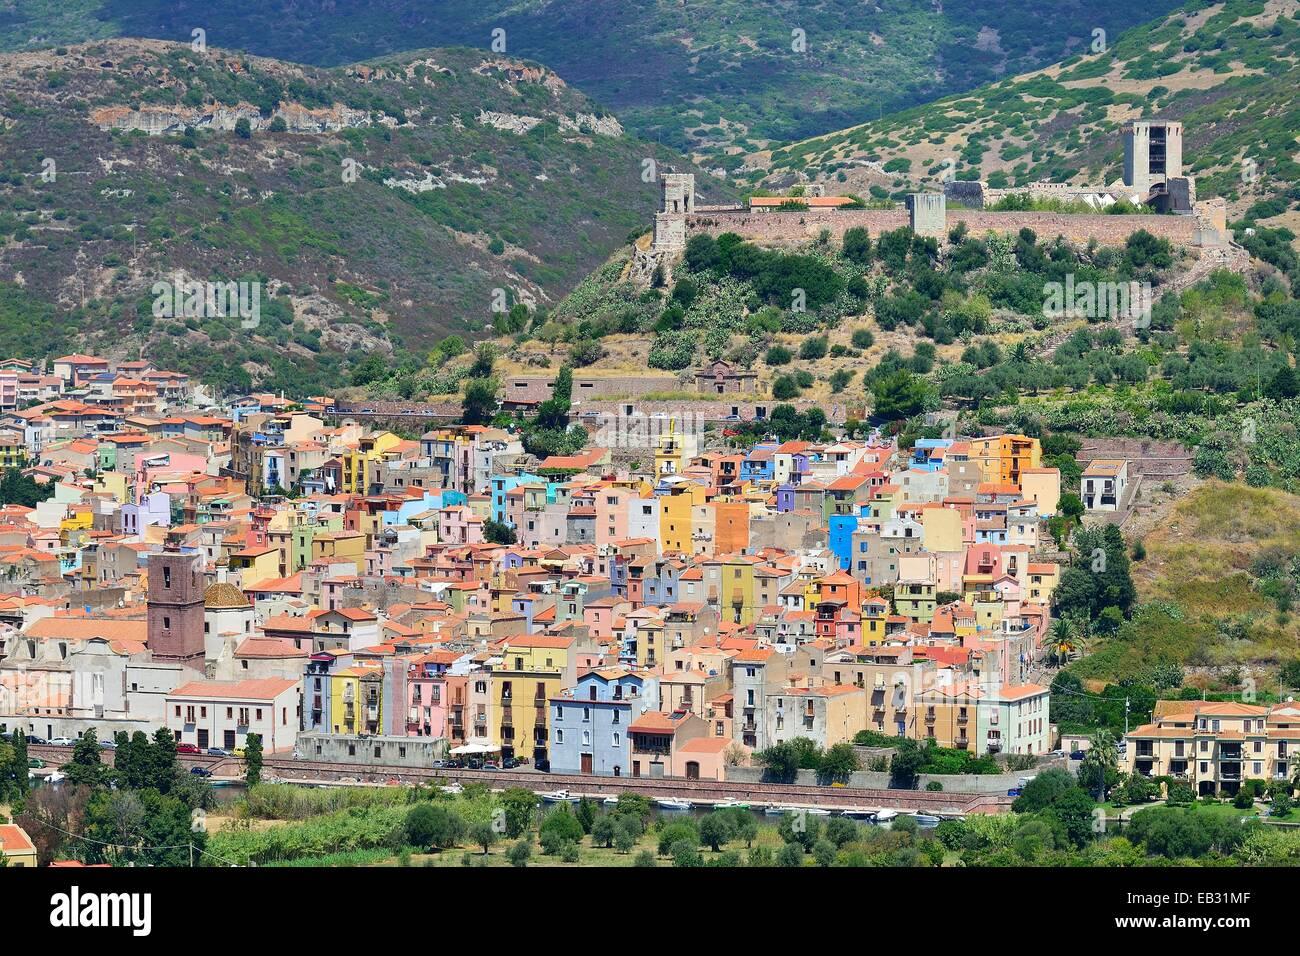 Der zerstörten Burg Malaspina dominiert die Altstadt, Bosa, Provinz Oristano, Sardinien, Italien Stockfoto